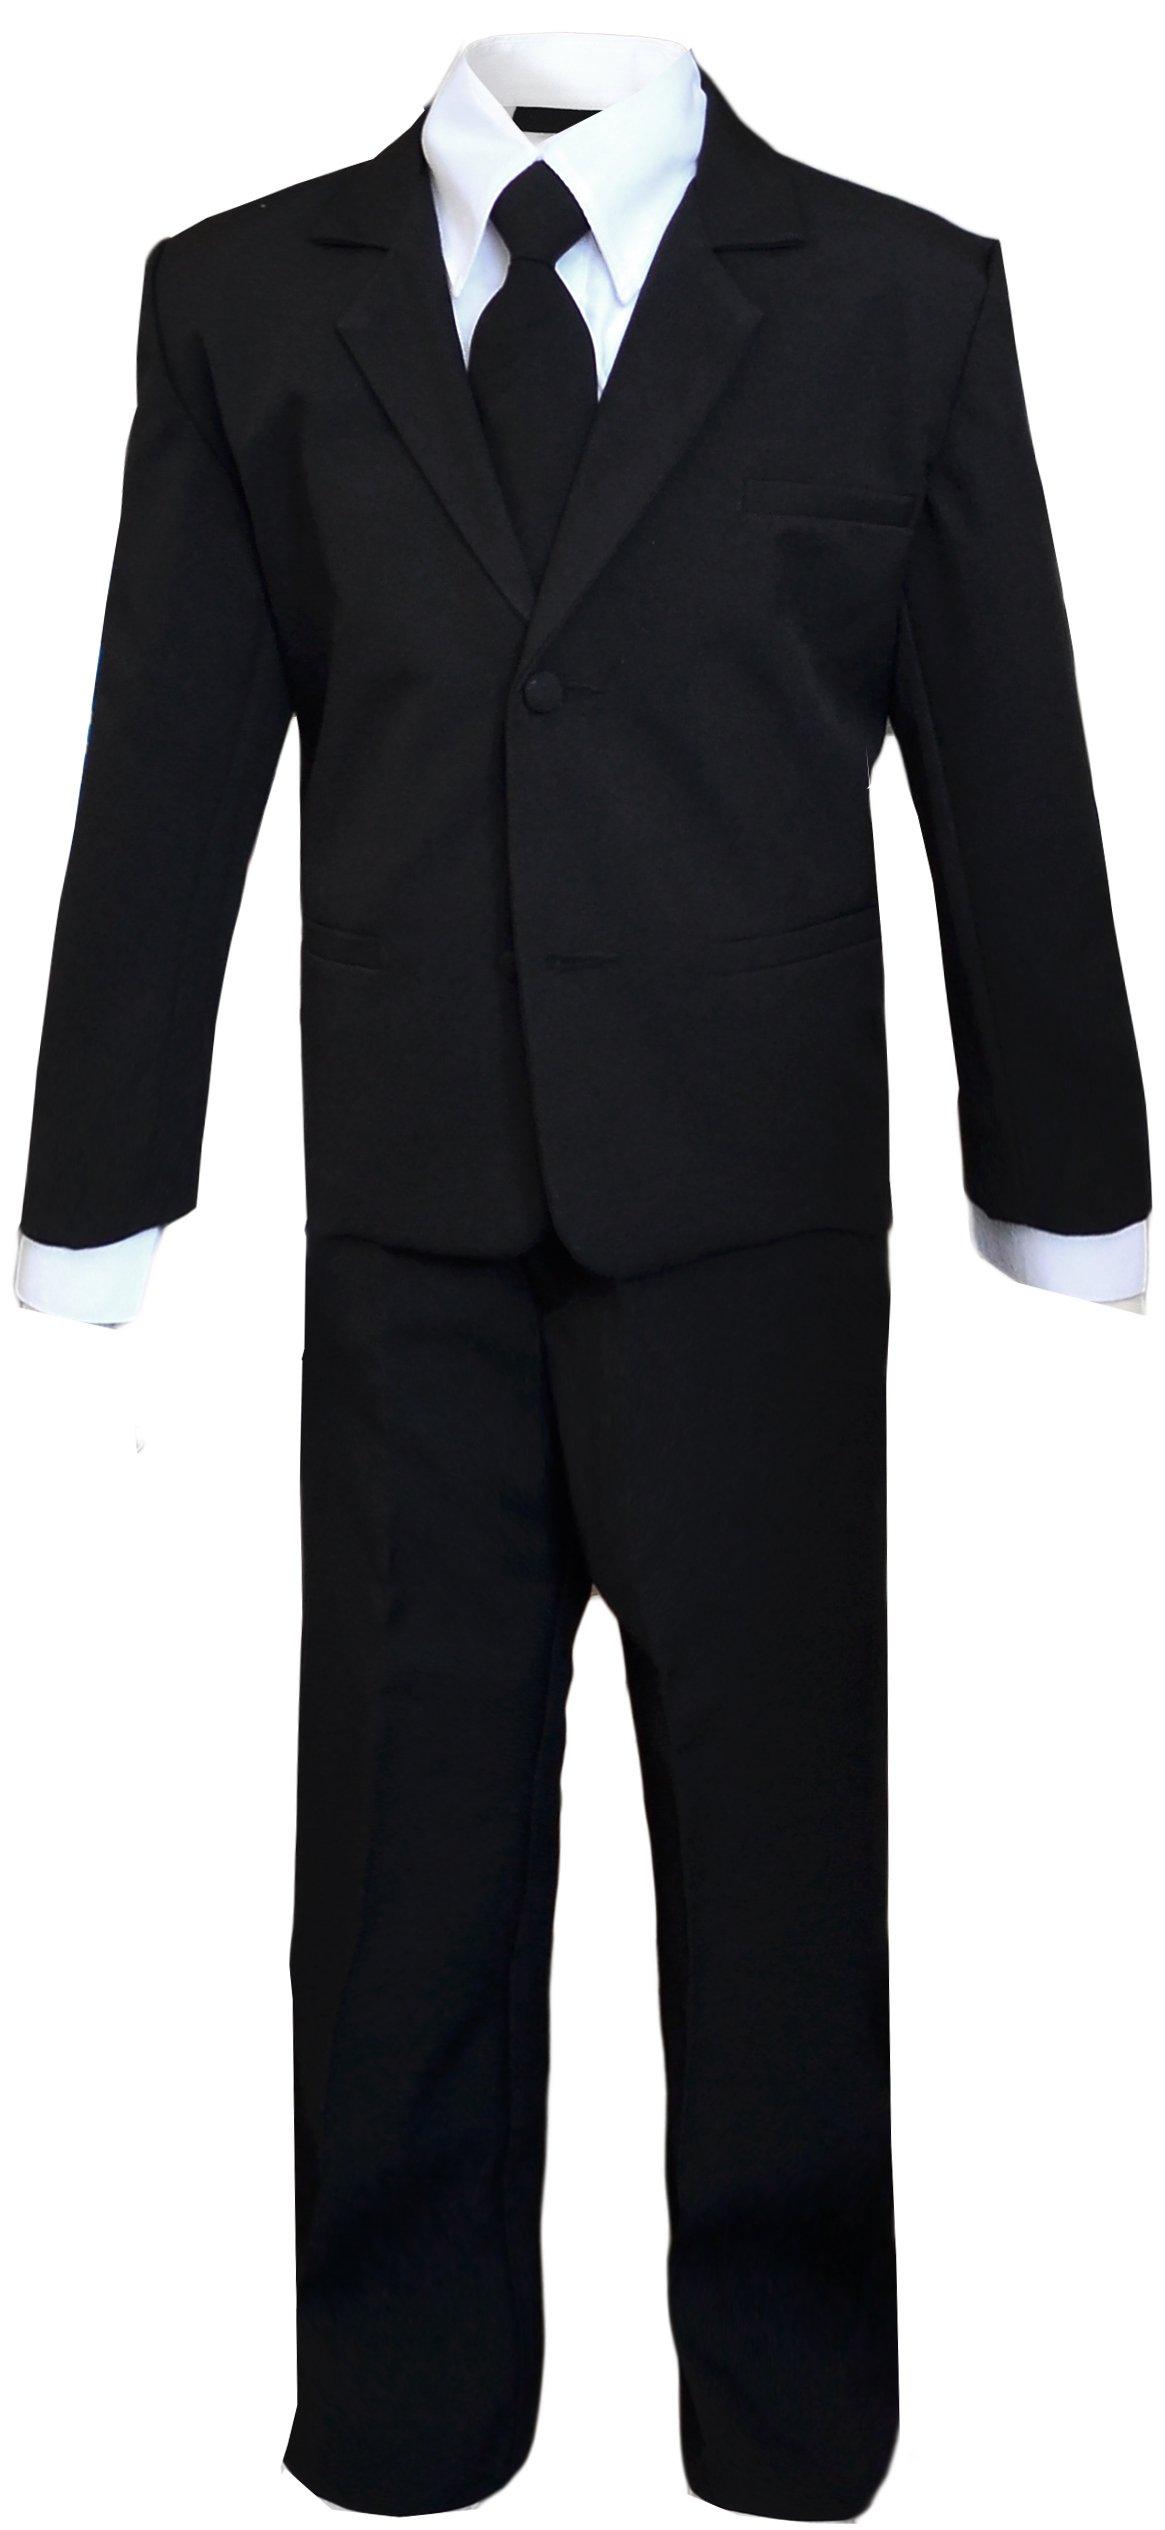 Kids Slenderman Agent Black Suit Costume Only Size 5